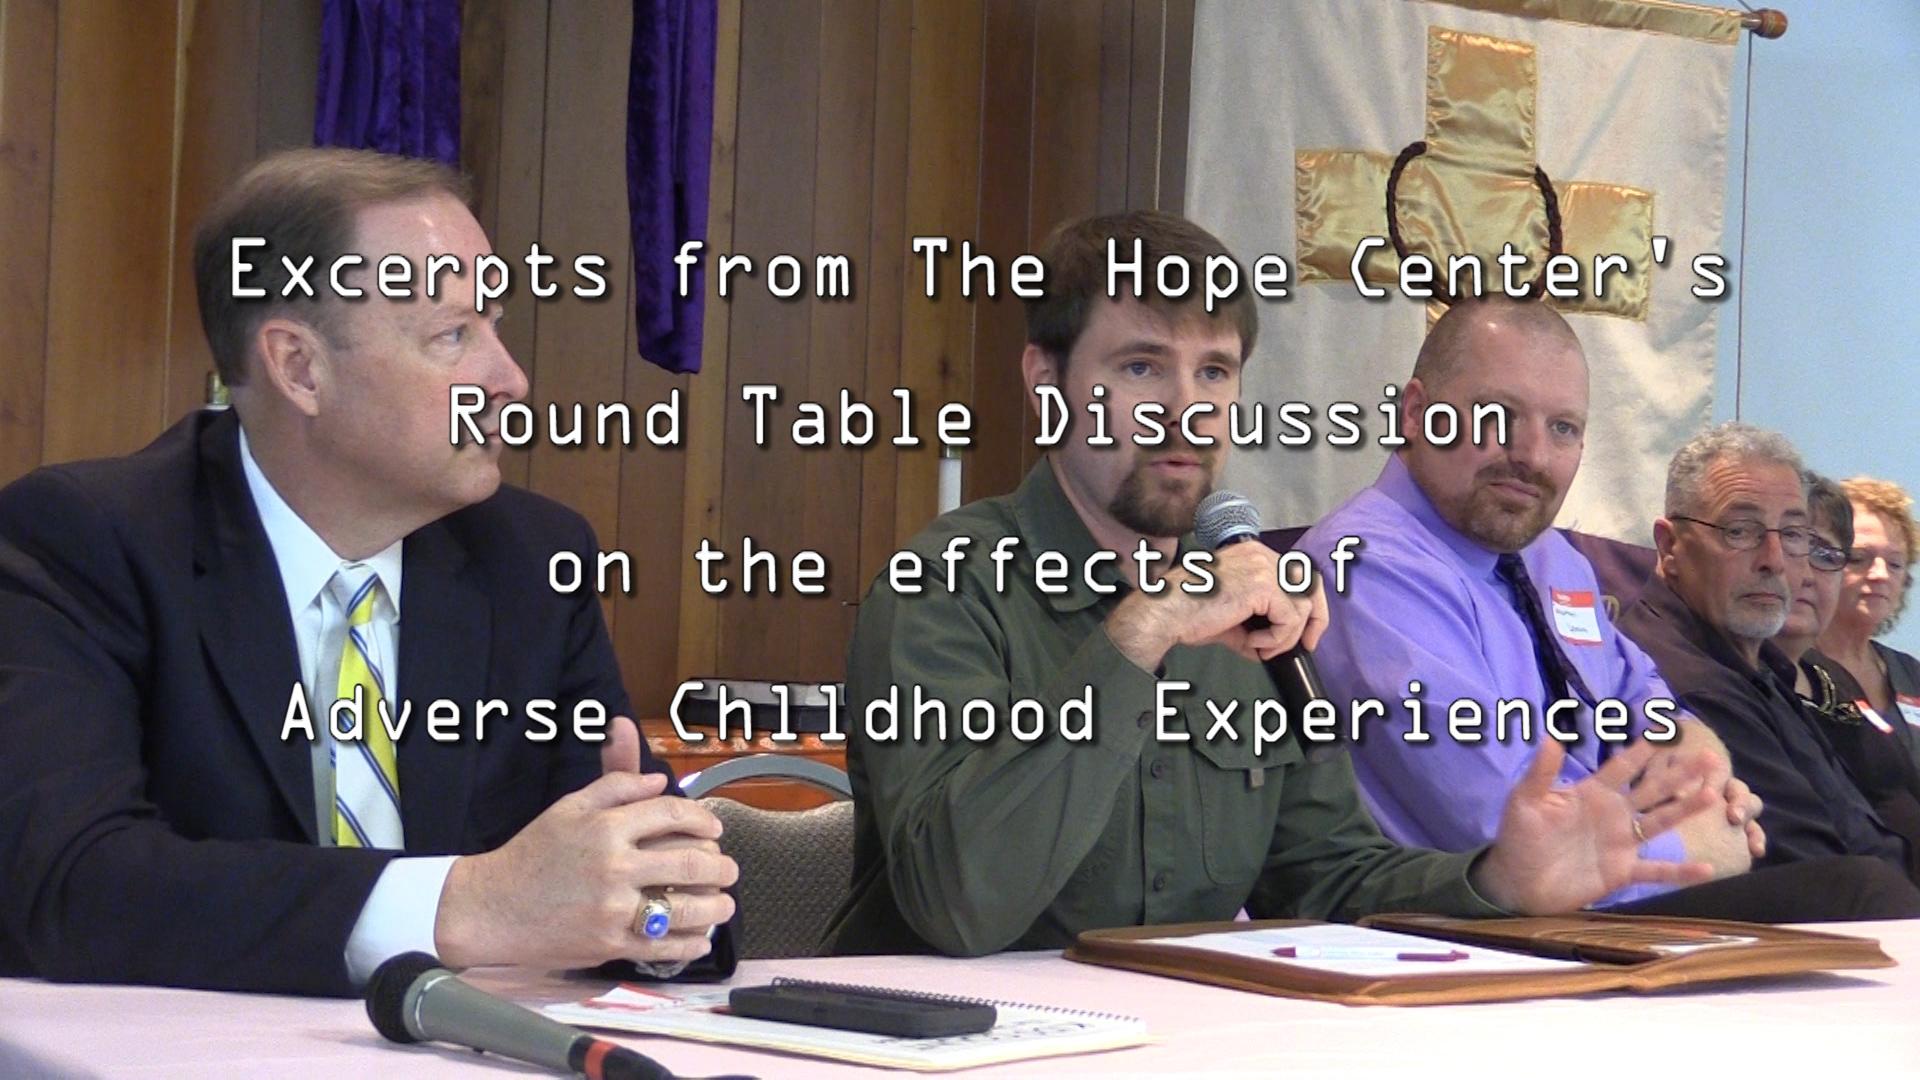 VIDEO - Adverse Childhood Experiences seminar